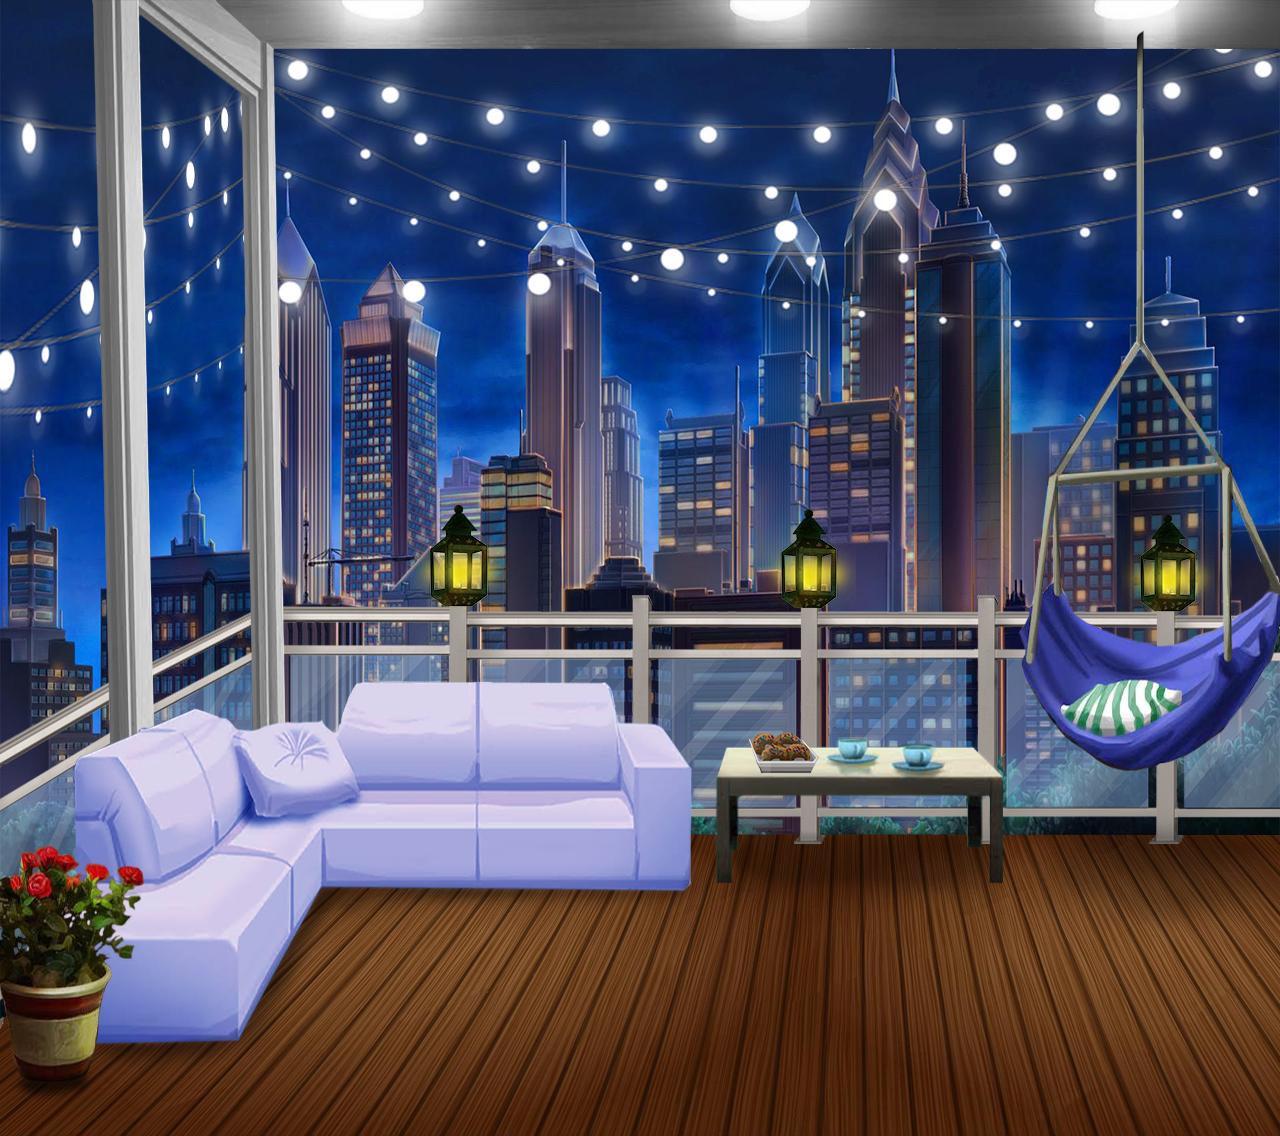 Anime Apartment: #anime Backgrounds #balcony #cozy #EXT #night EXT. COZY